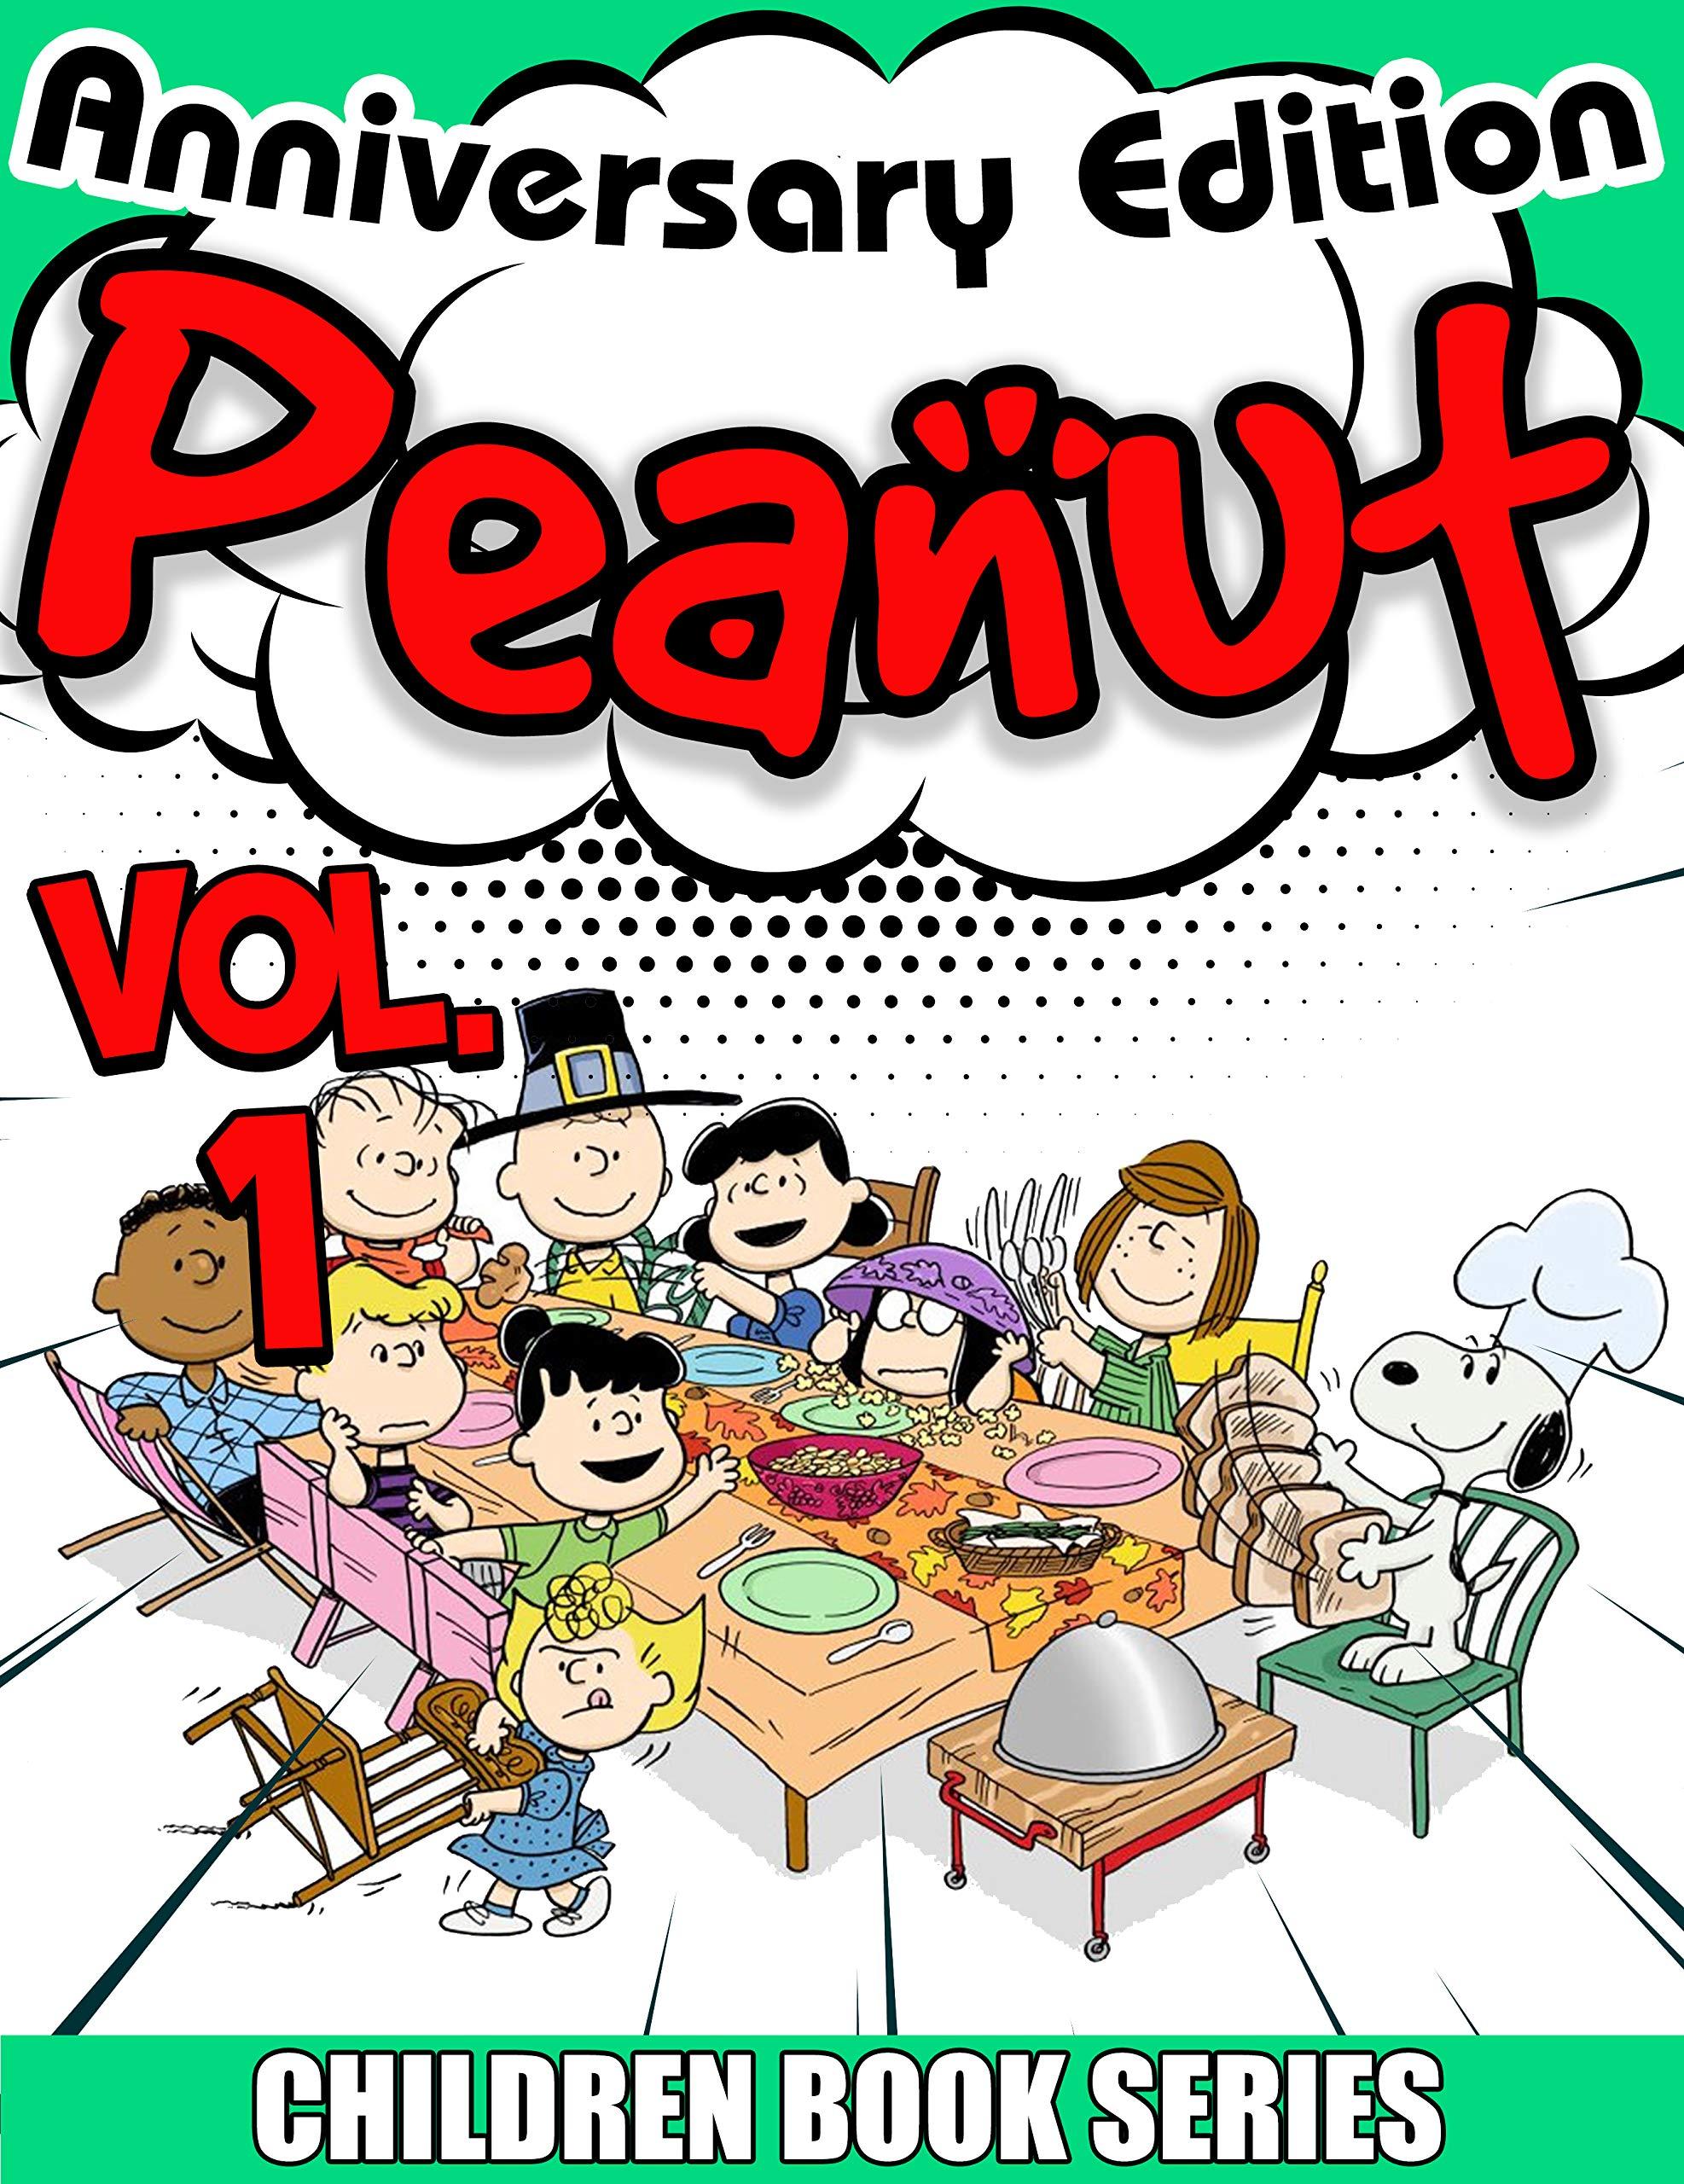 Children book series Peanuts Anniversary Edition: Peanuts Limited Edition Vol 1